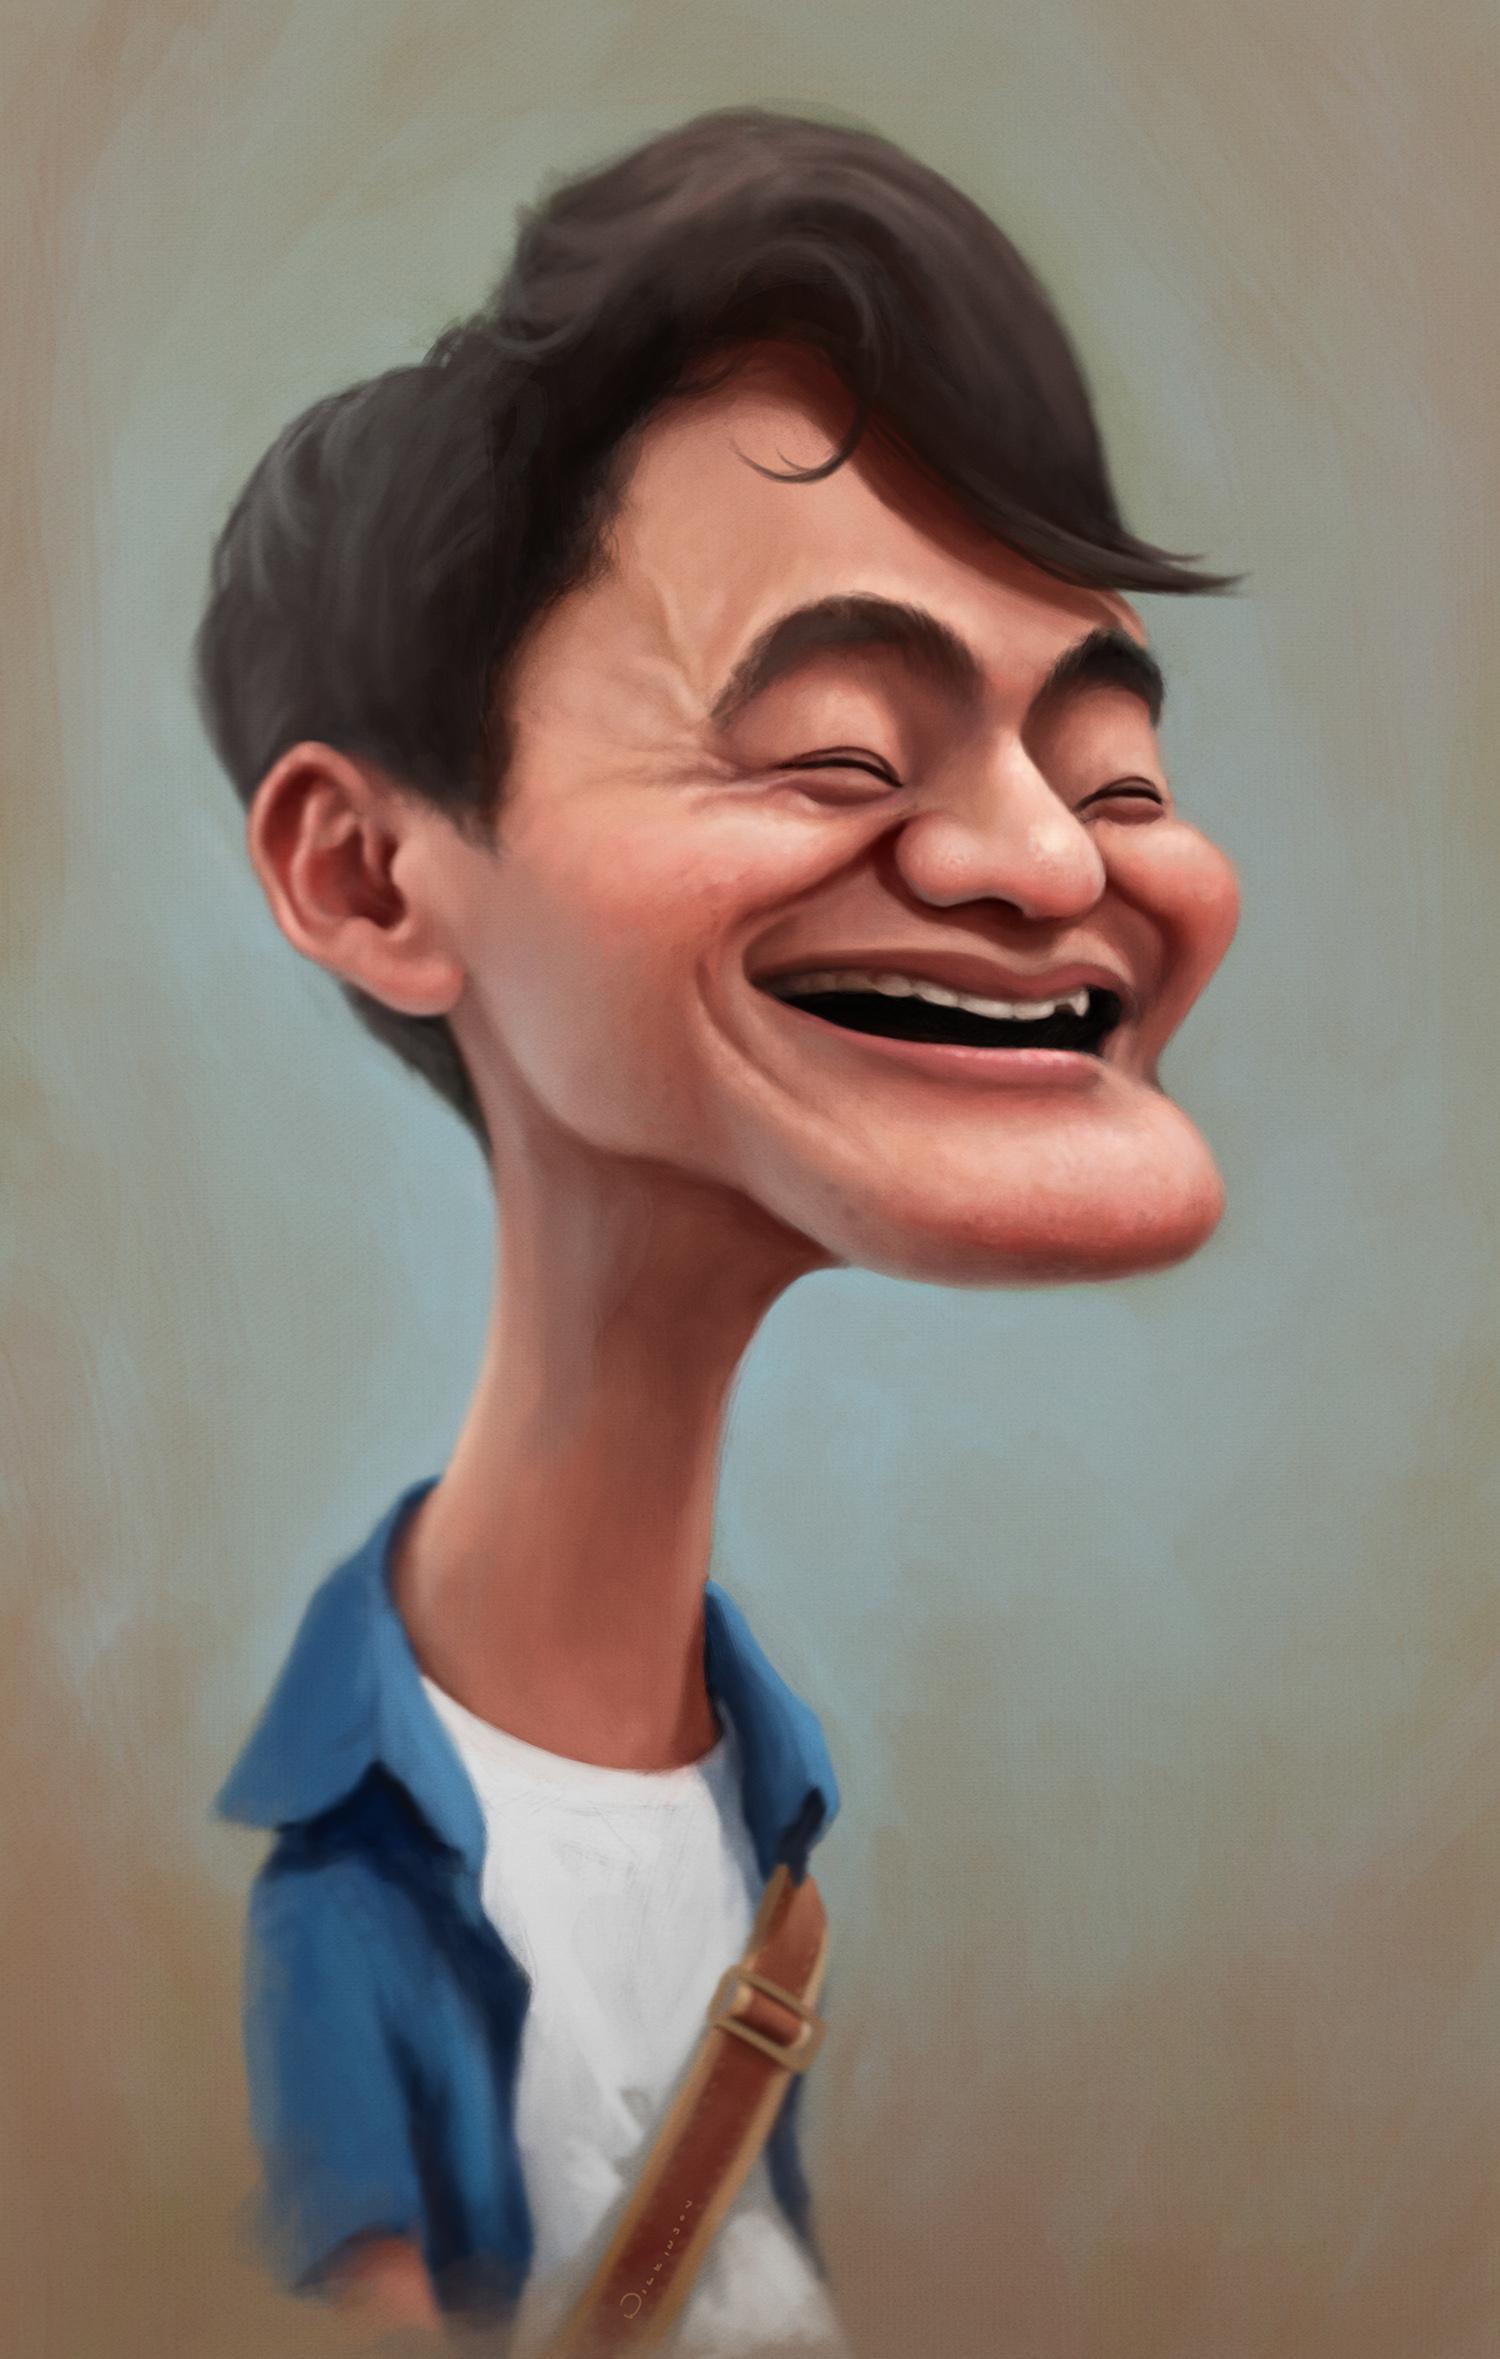 Ainori Shy boy caricature